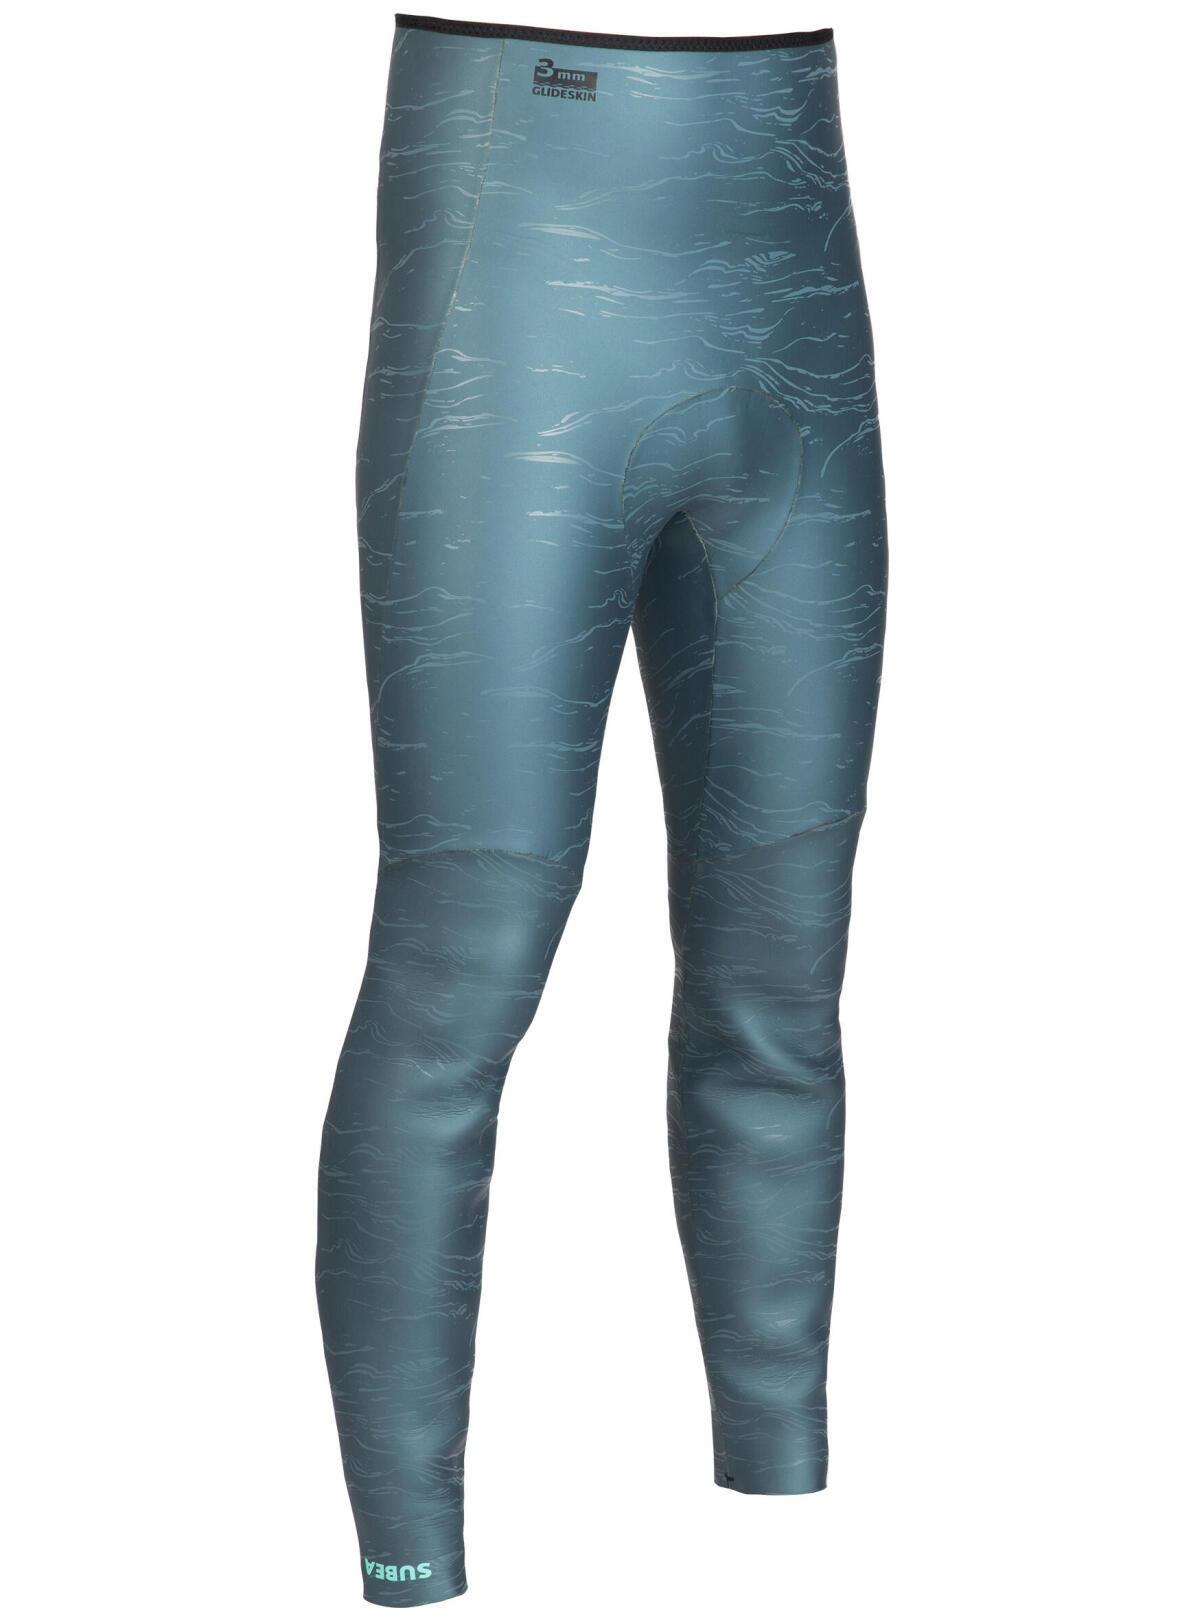 SUBEA Pantalón apnea FRD900 3mm gris PE19 AH19